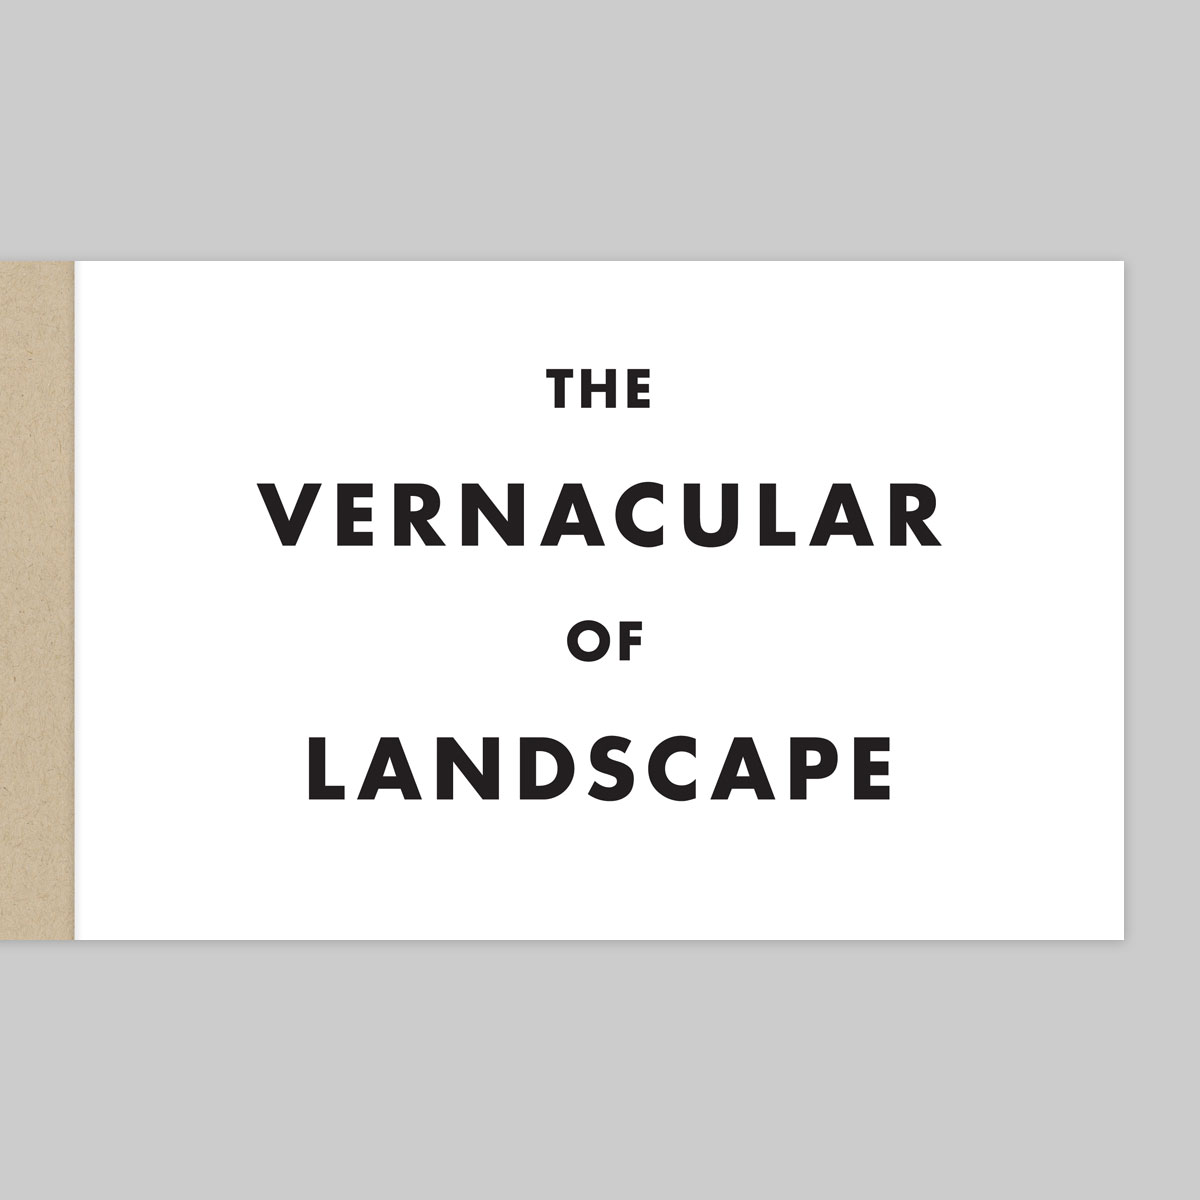 The-Vernacular-of-Landscape-Spread-1-1.jpg